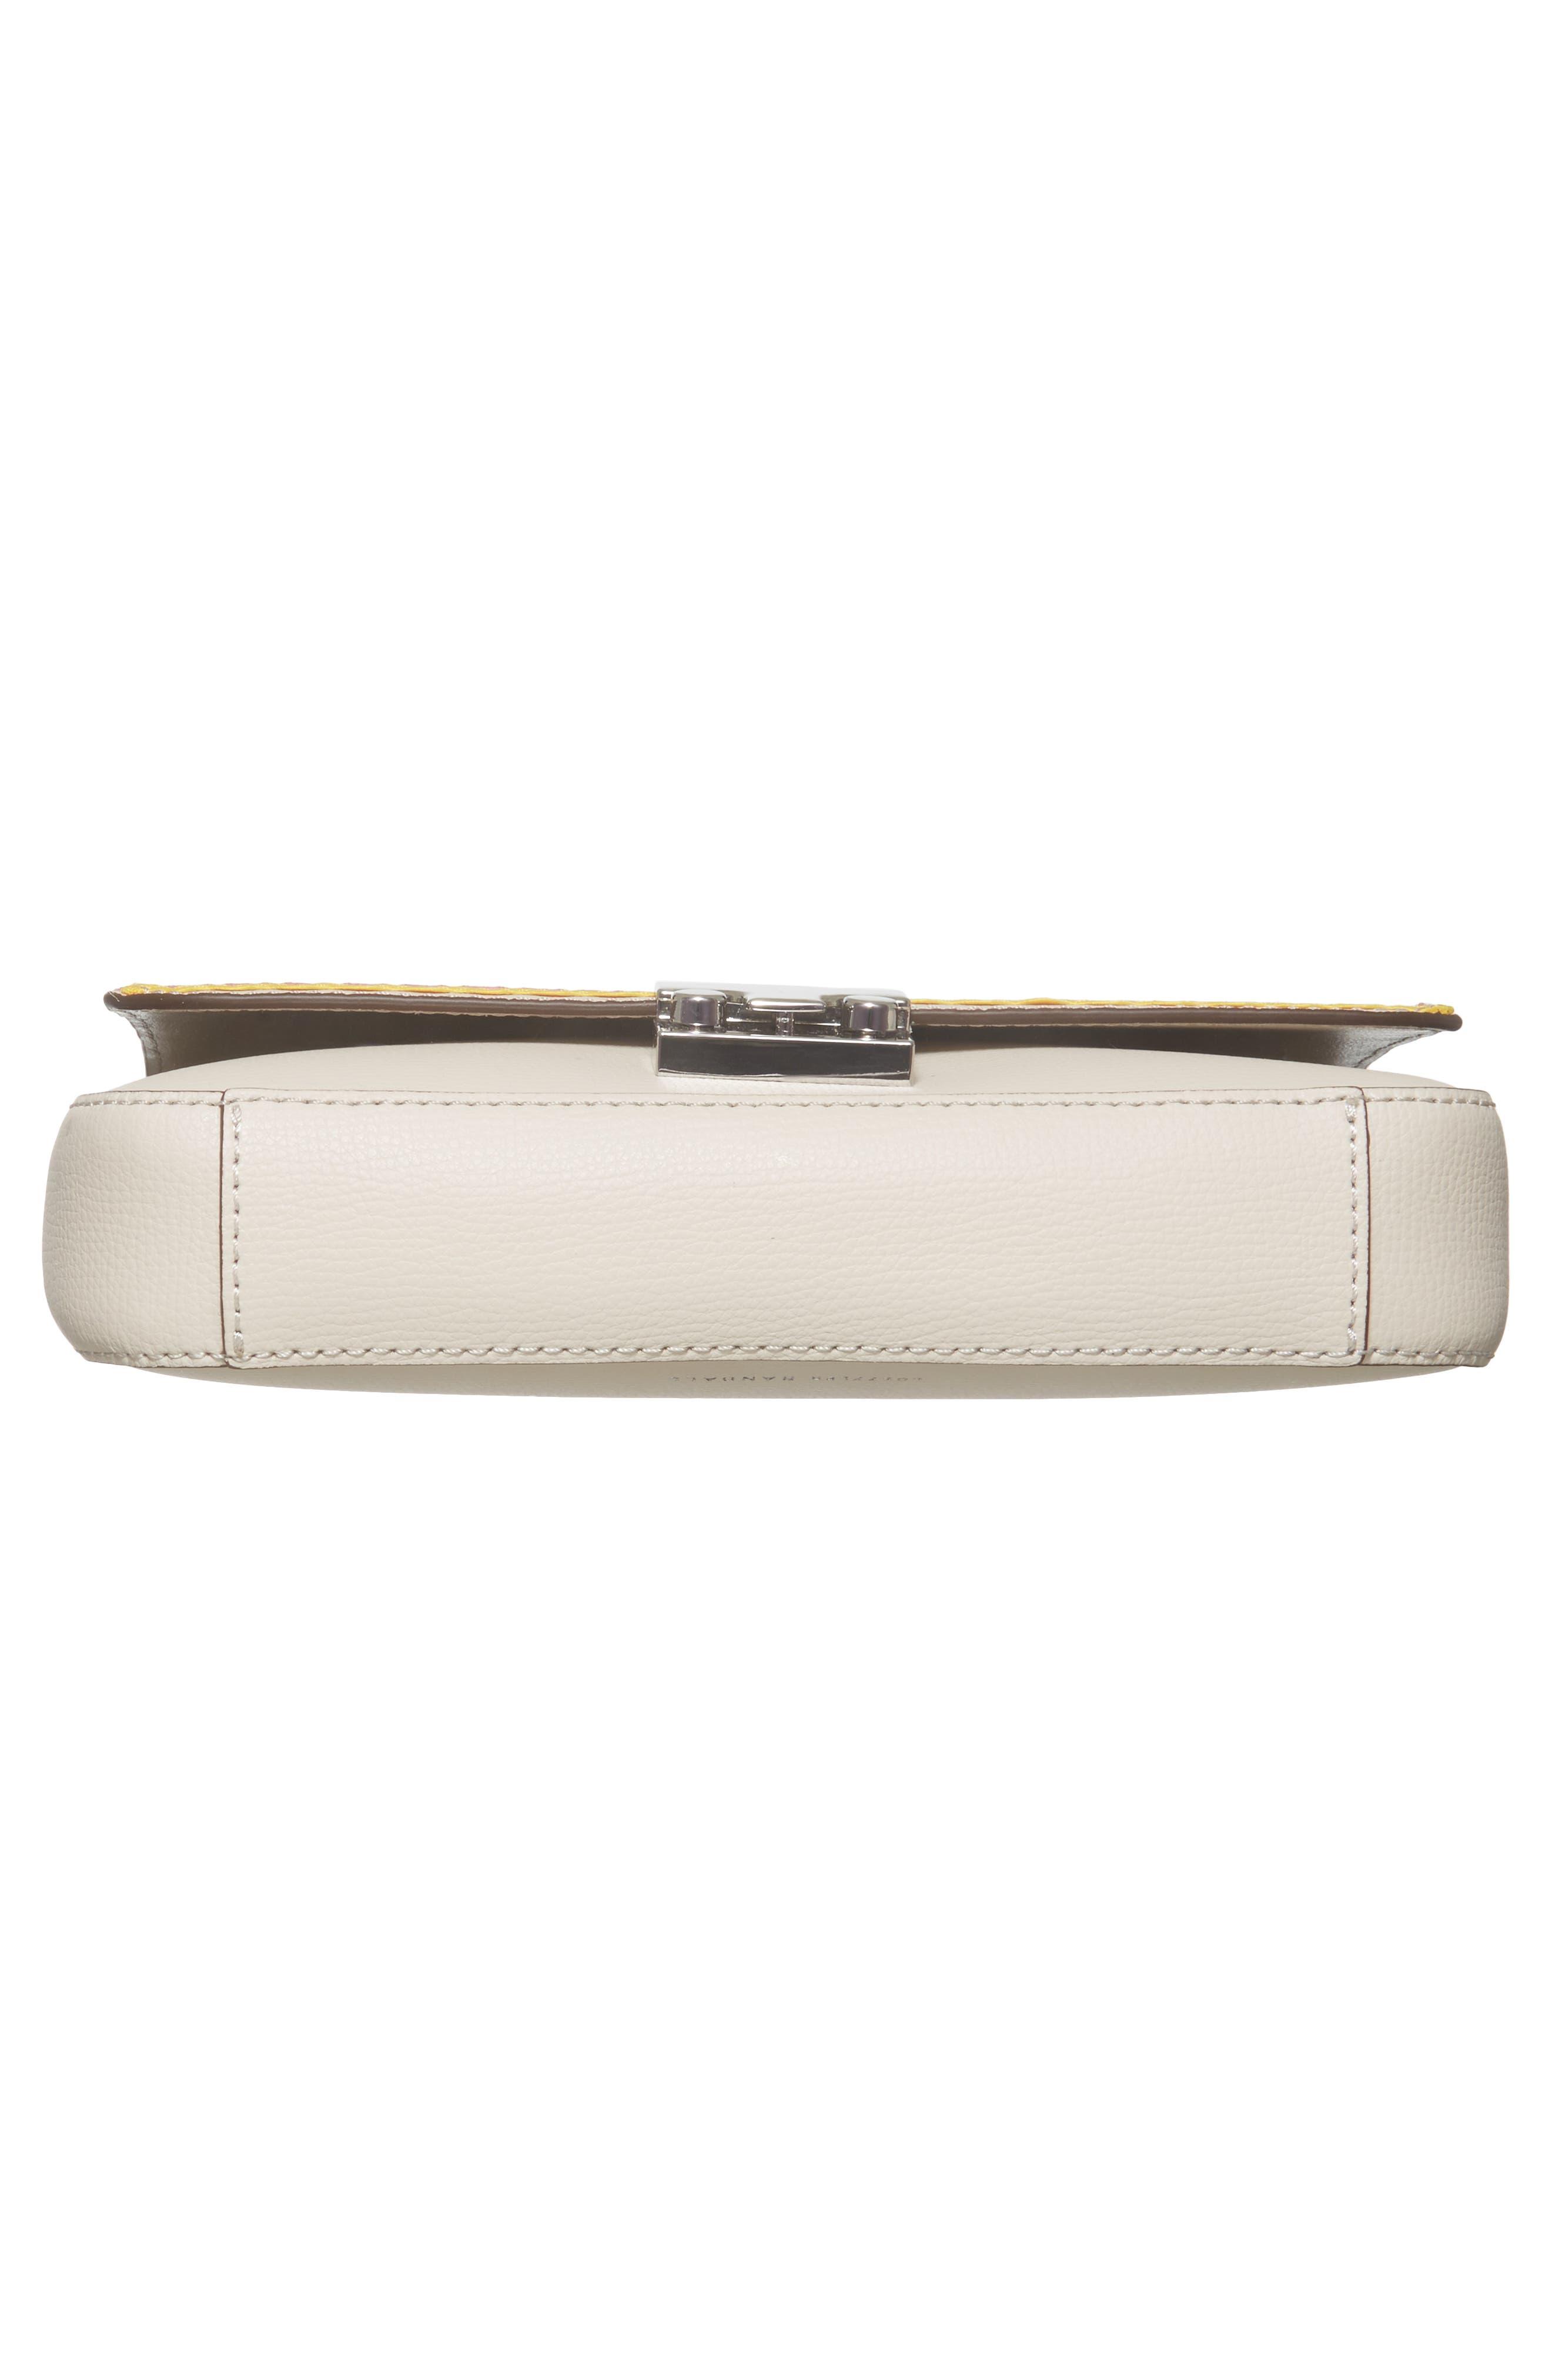 Lock Leather Flap Clutch/Shoulder Bag,                             Alternate thumbnail 6, color,                             030